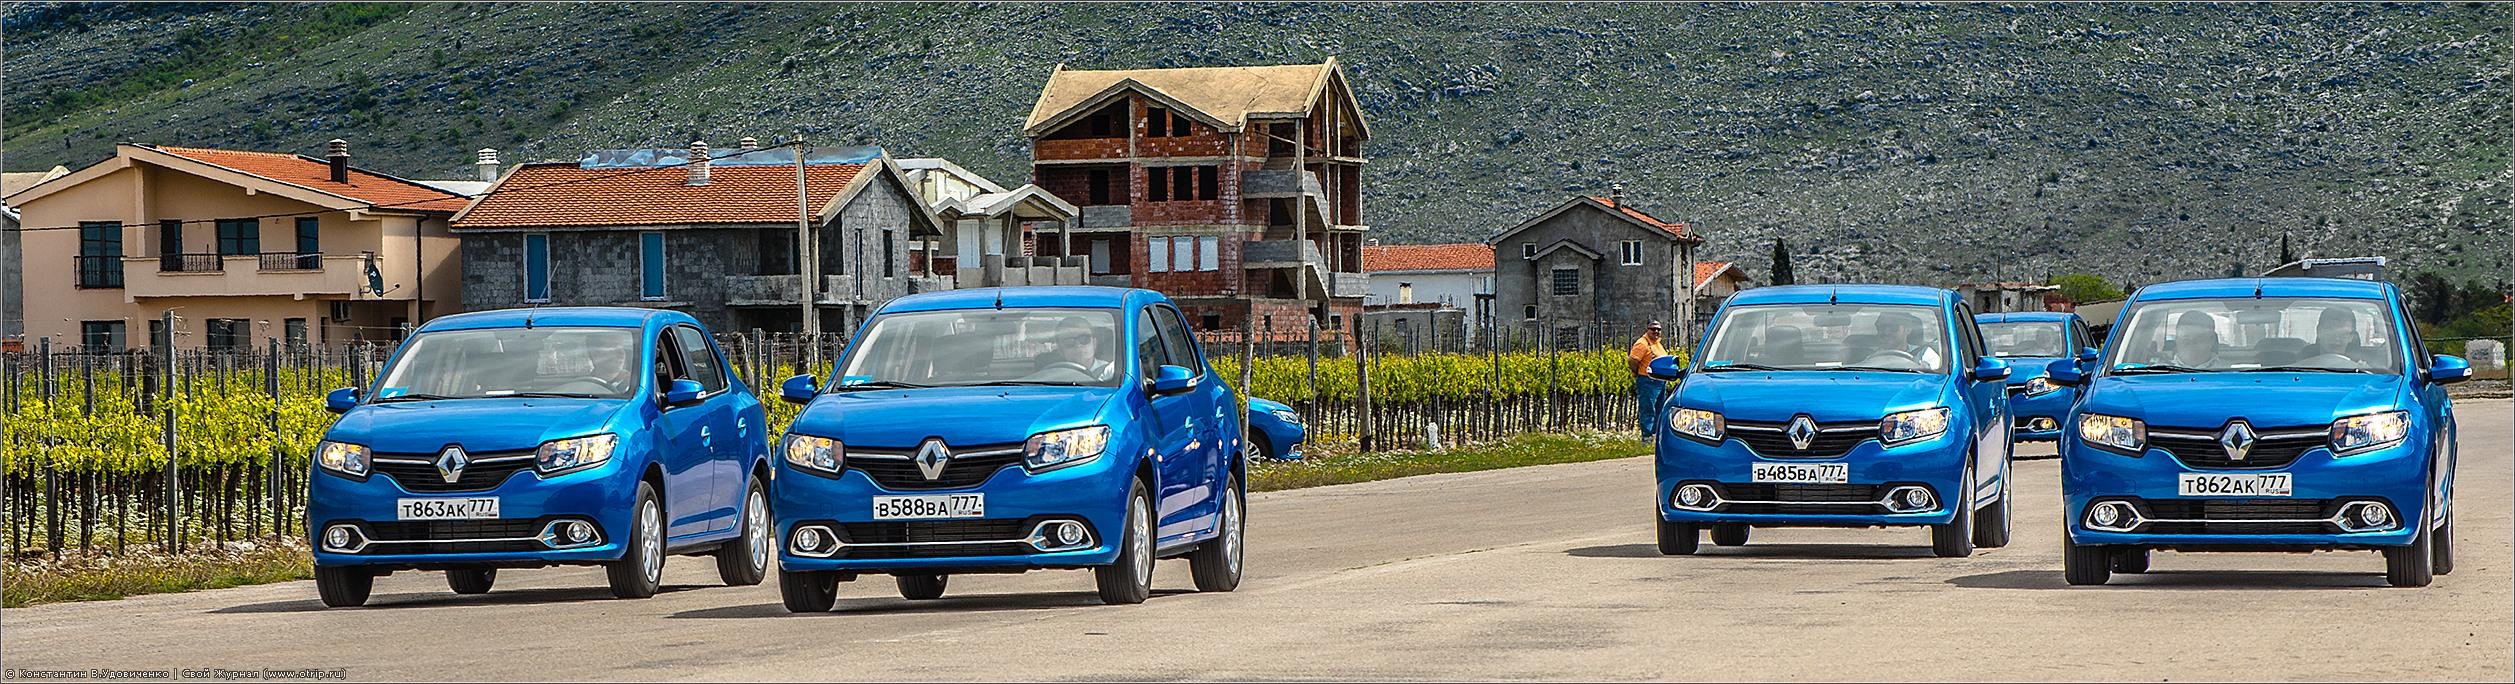 126-3708p.jpg - Тест-драйв нового Renault Logan (16-18.04.2014)